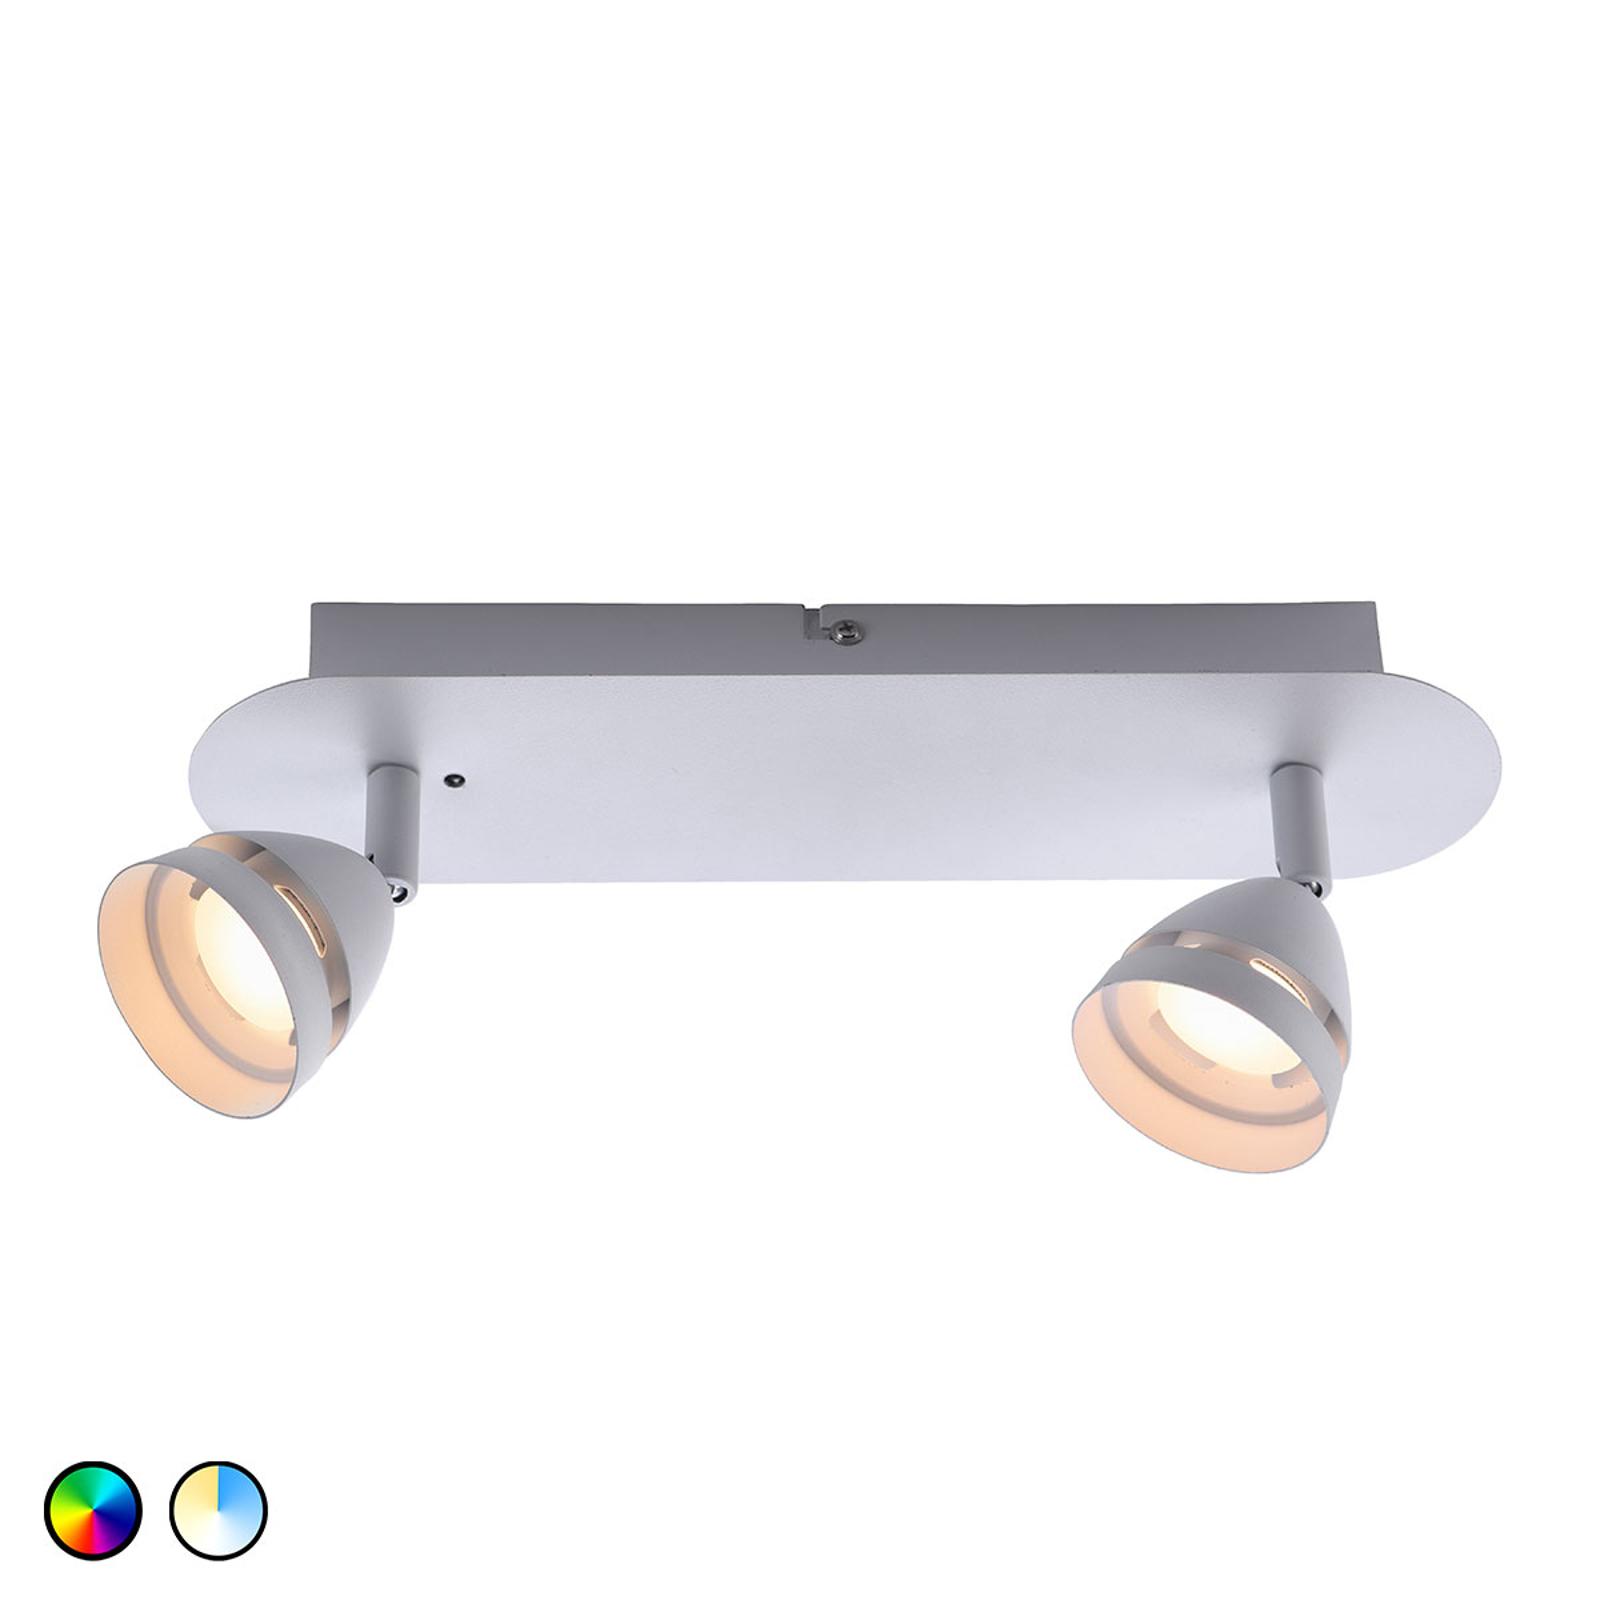 Trio WiZ Gemini LED-loftlampe, 2 lyskilder, hvid